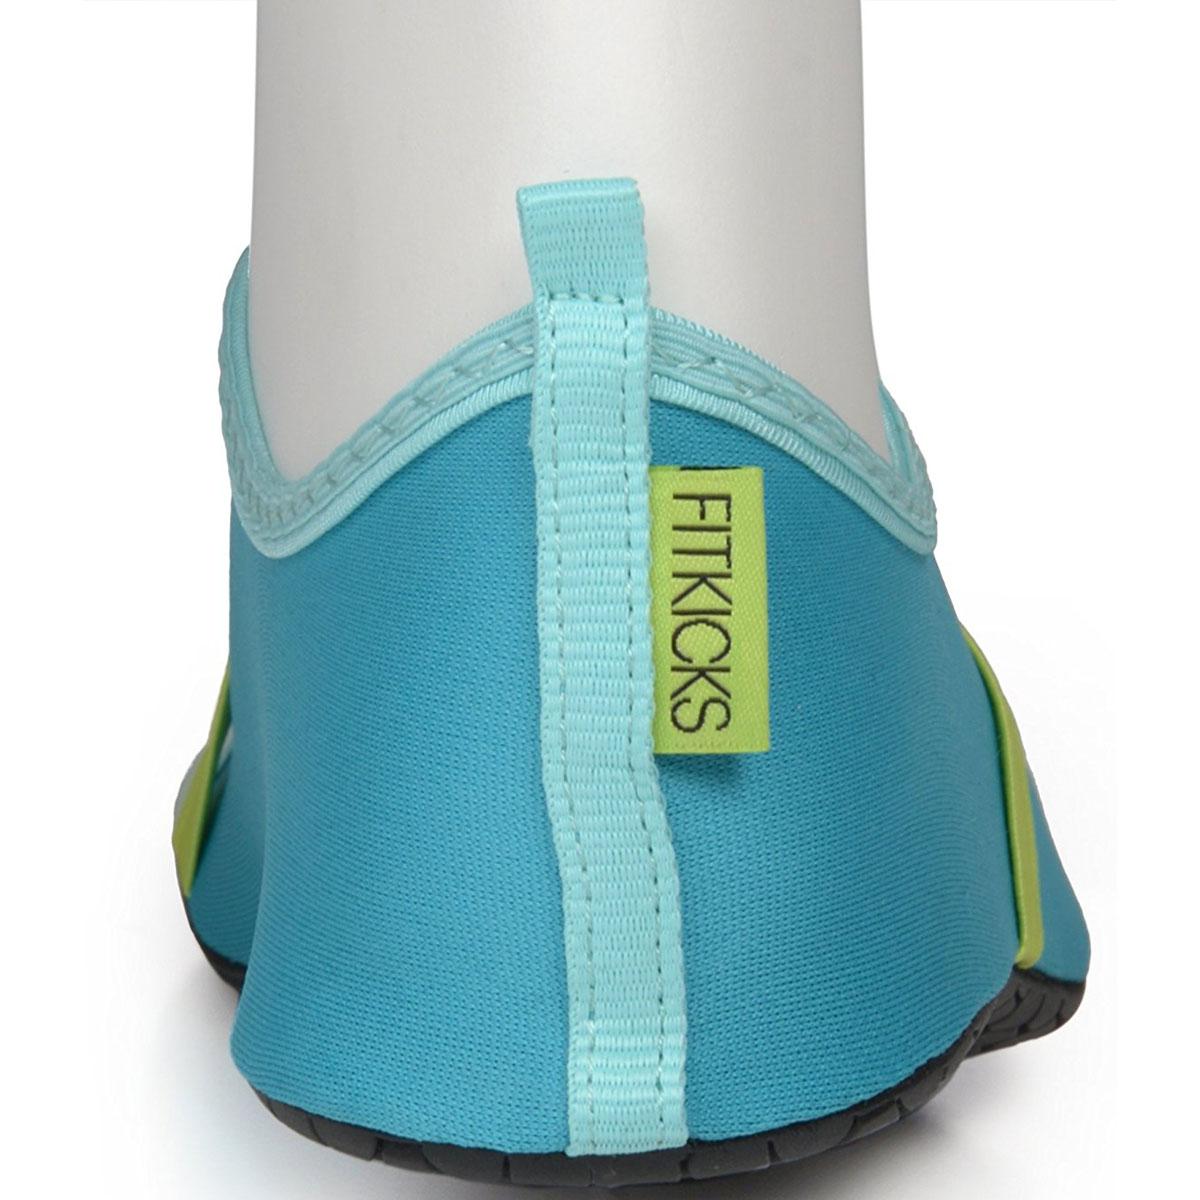 FitKicks-Women-039-s-Non-Slip-Sole-Active-Footwear thumbnail 37